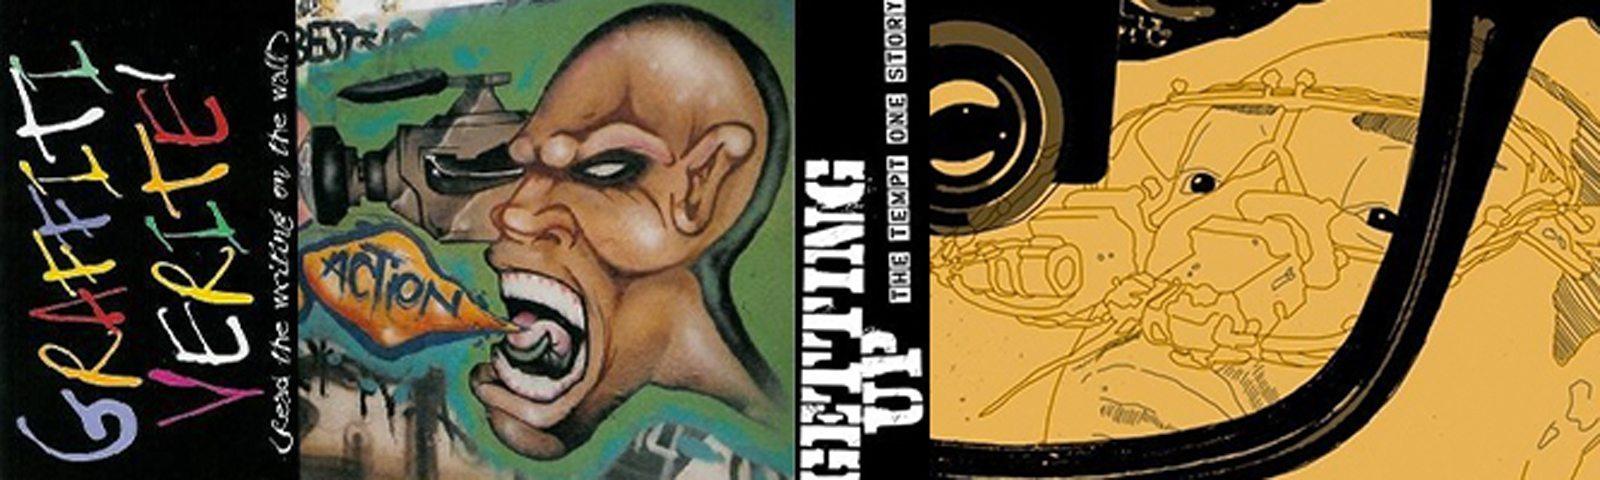 Graffiti Verite 5graffiti Movies & Documentaries